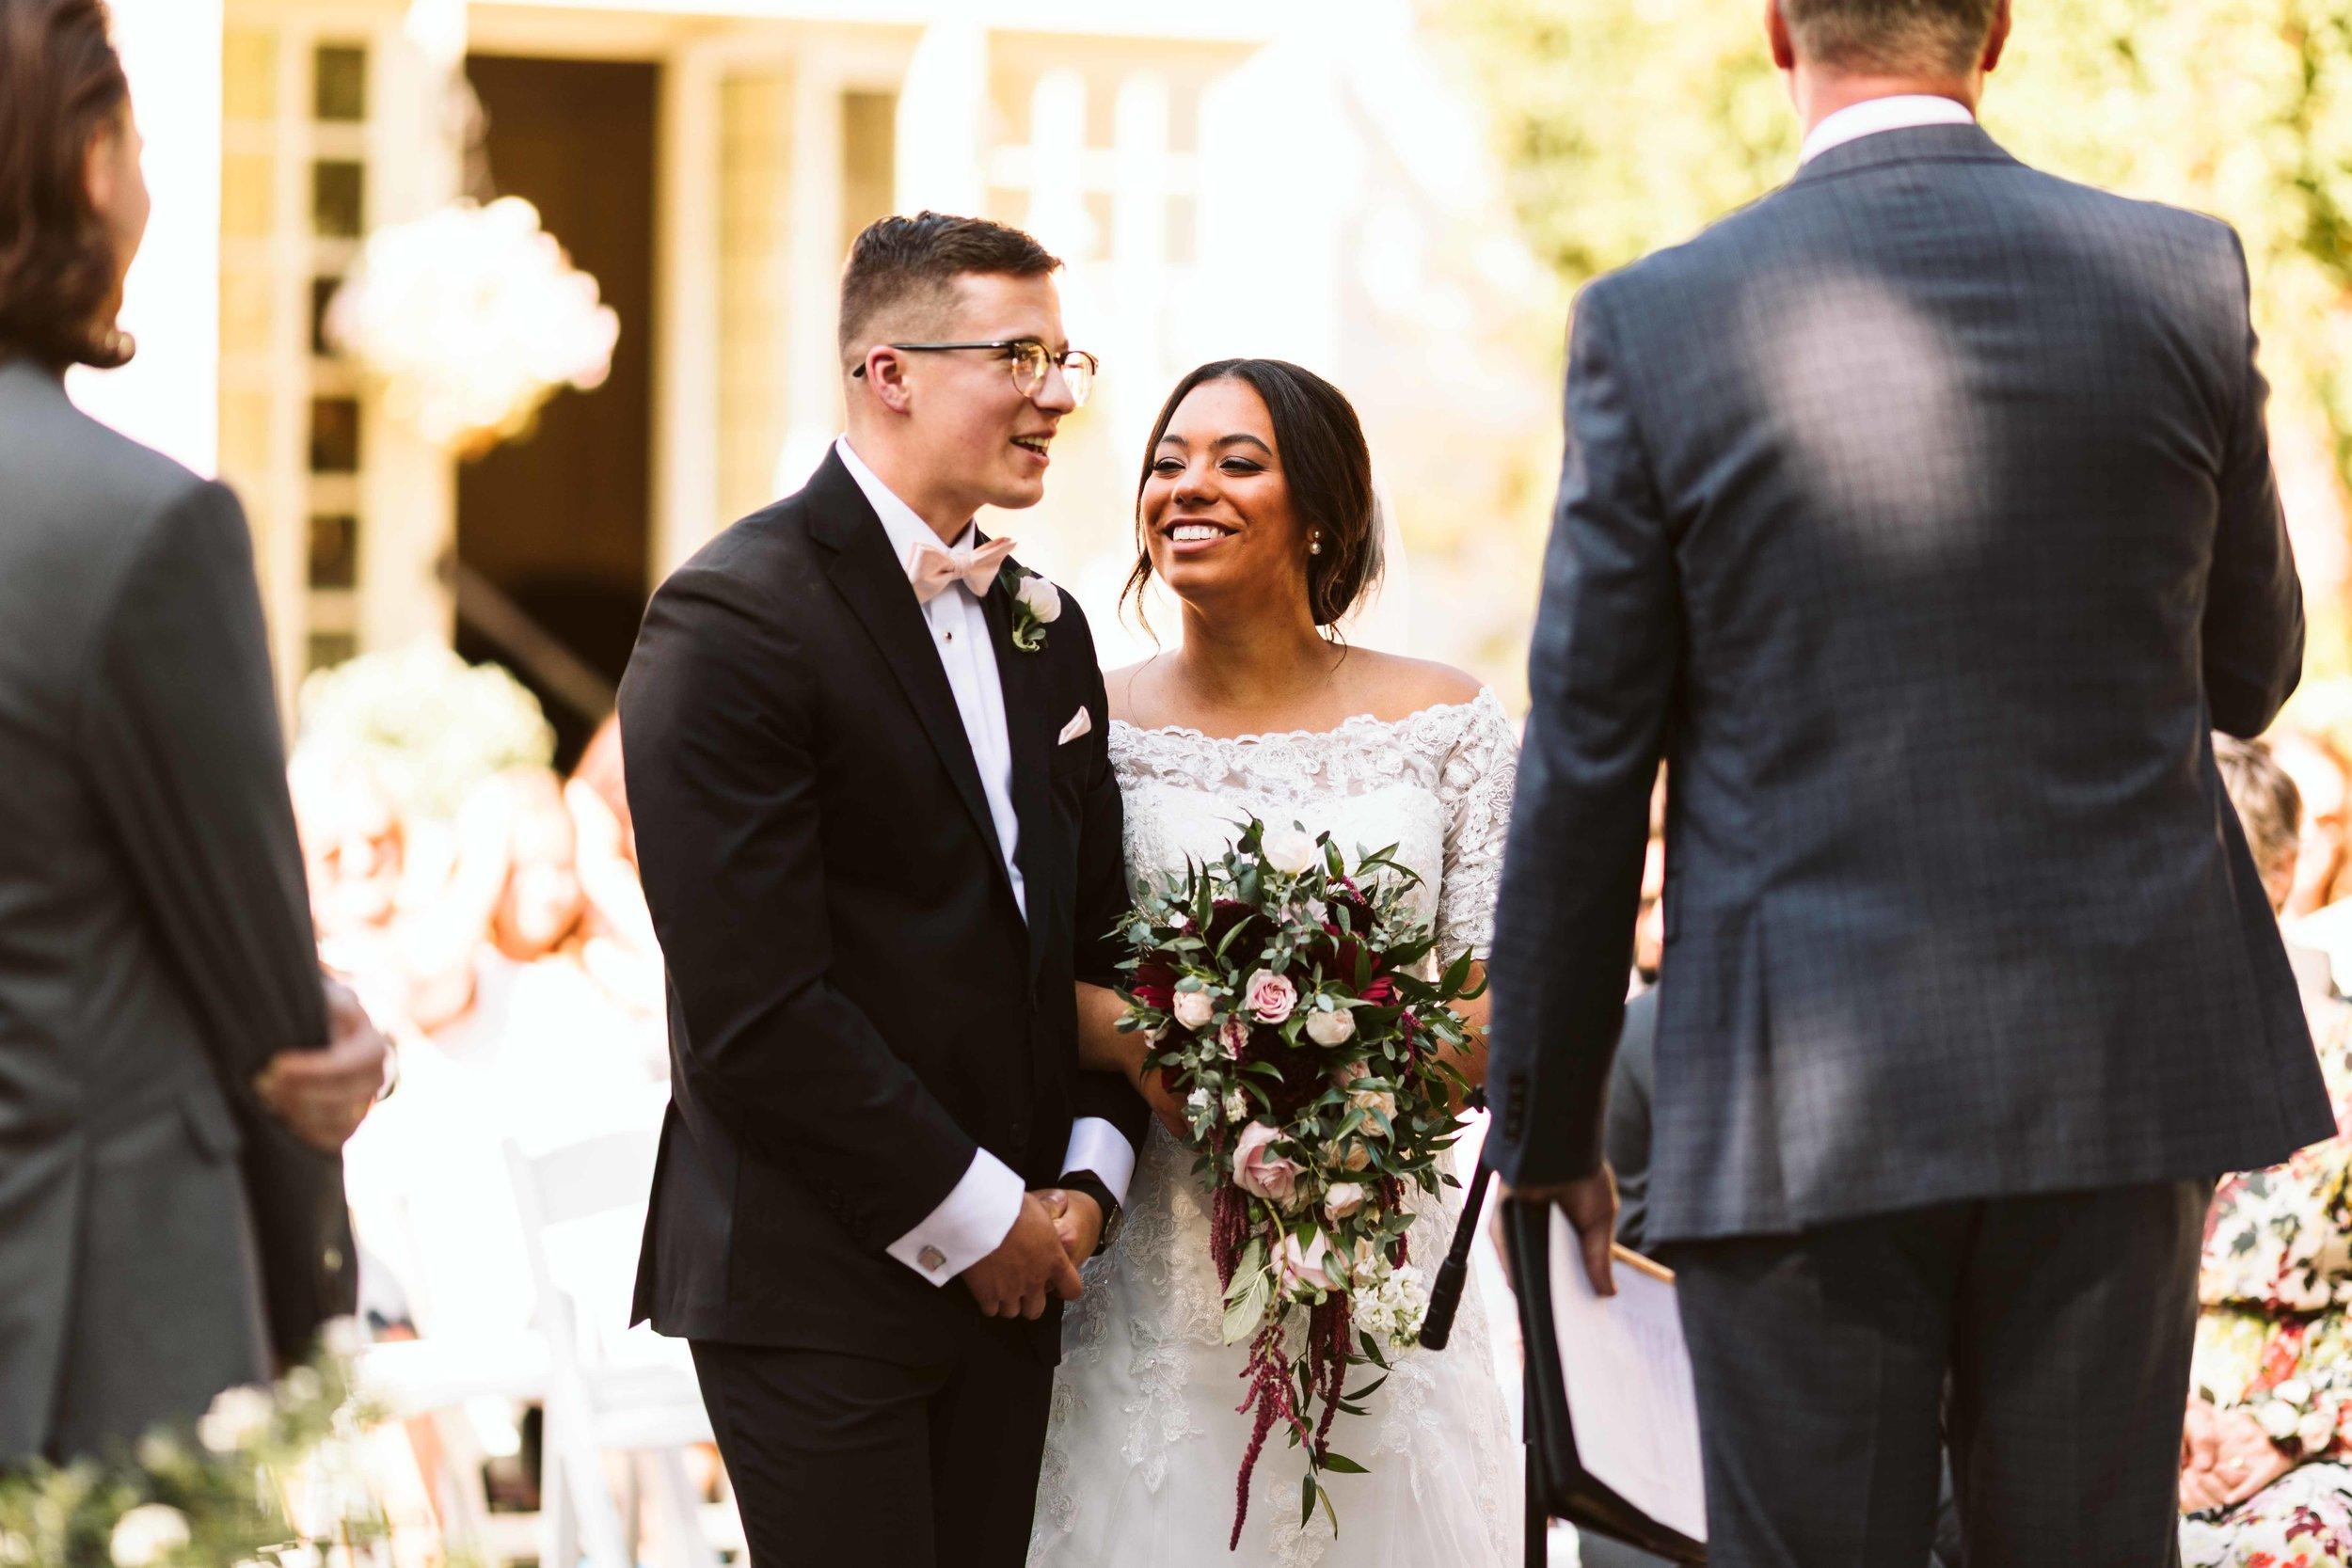 lairmont-manor-wedding-57.jpg